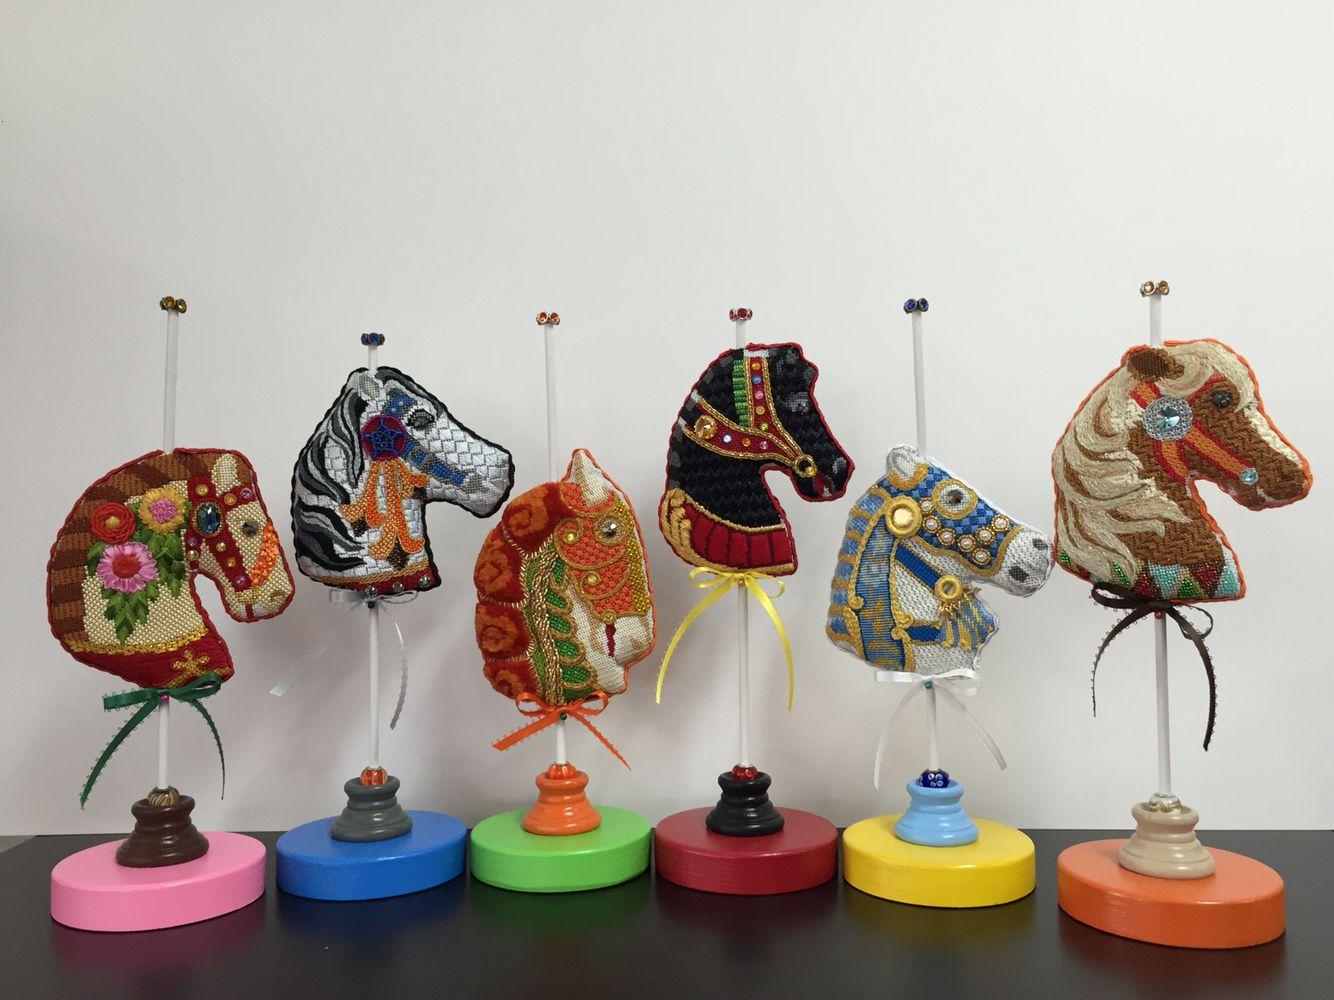 Carousel horses on stands   Design, Needlework, Carousel ...